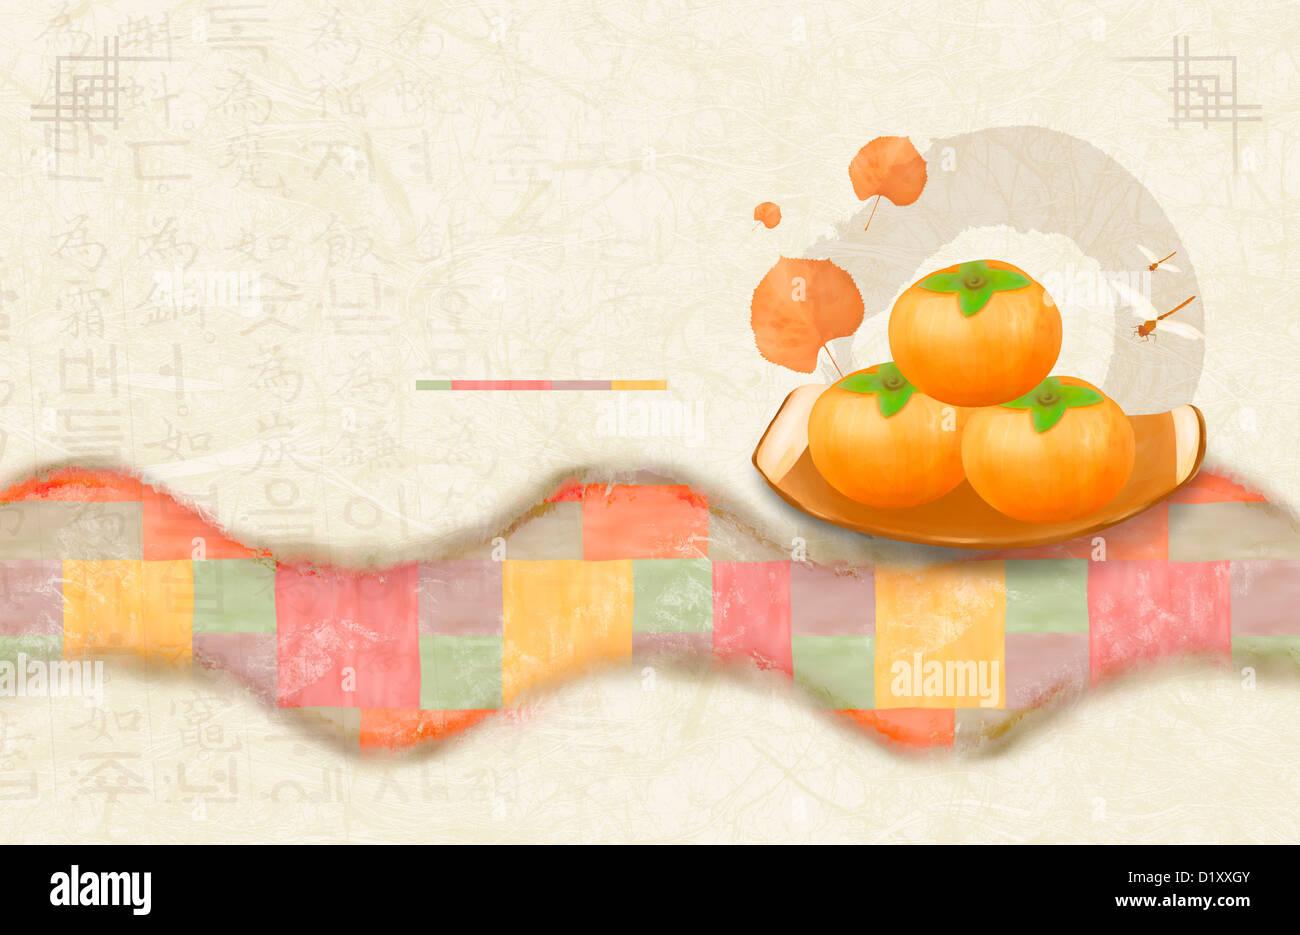 Ppt template illustration of korean design with persimmon stock ppt template illustration of korean design with persimmon toneelgroepblik Choice Image